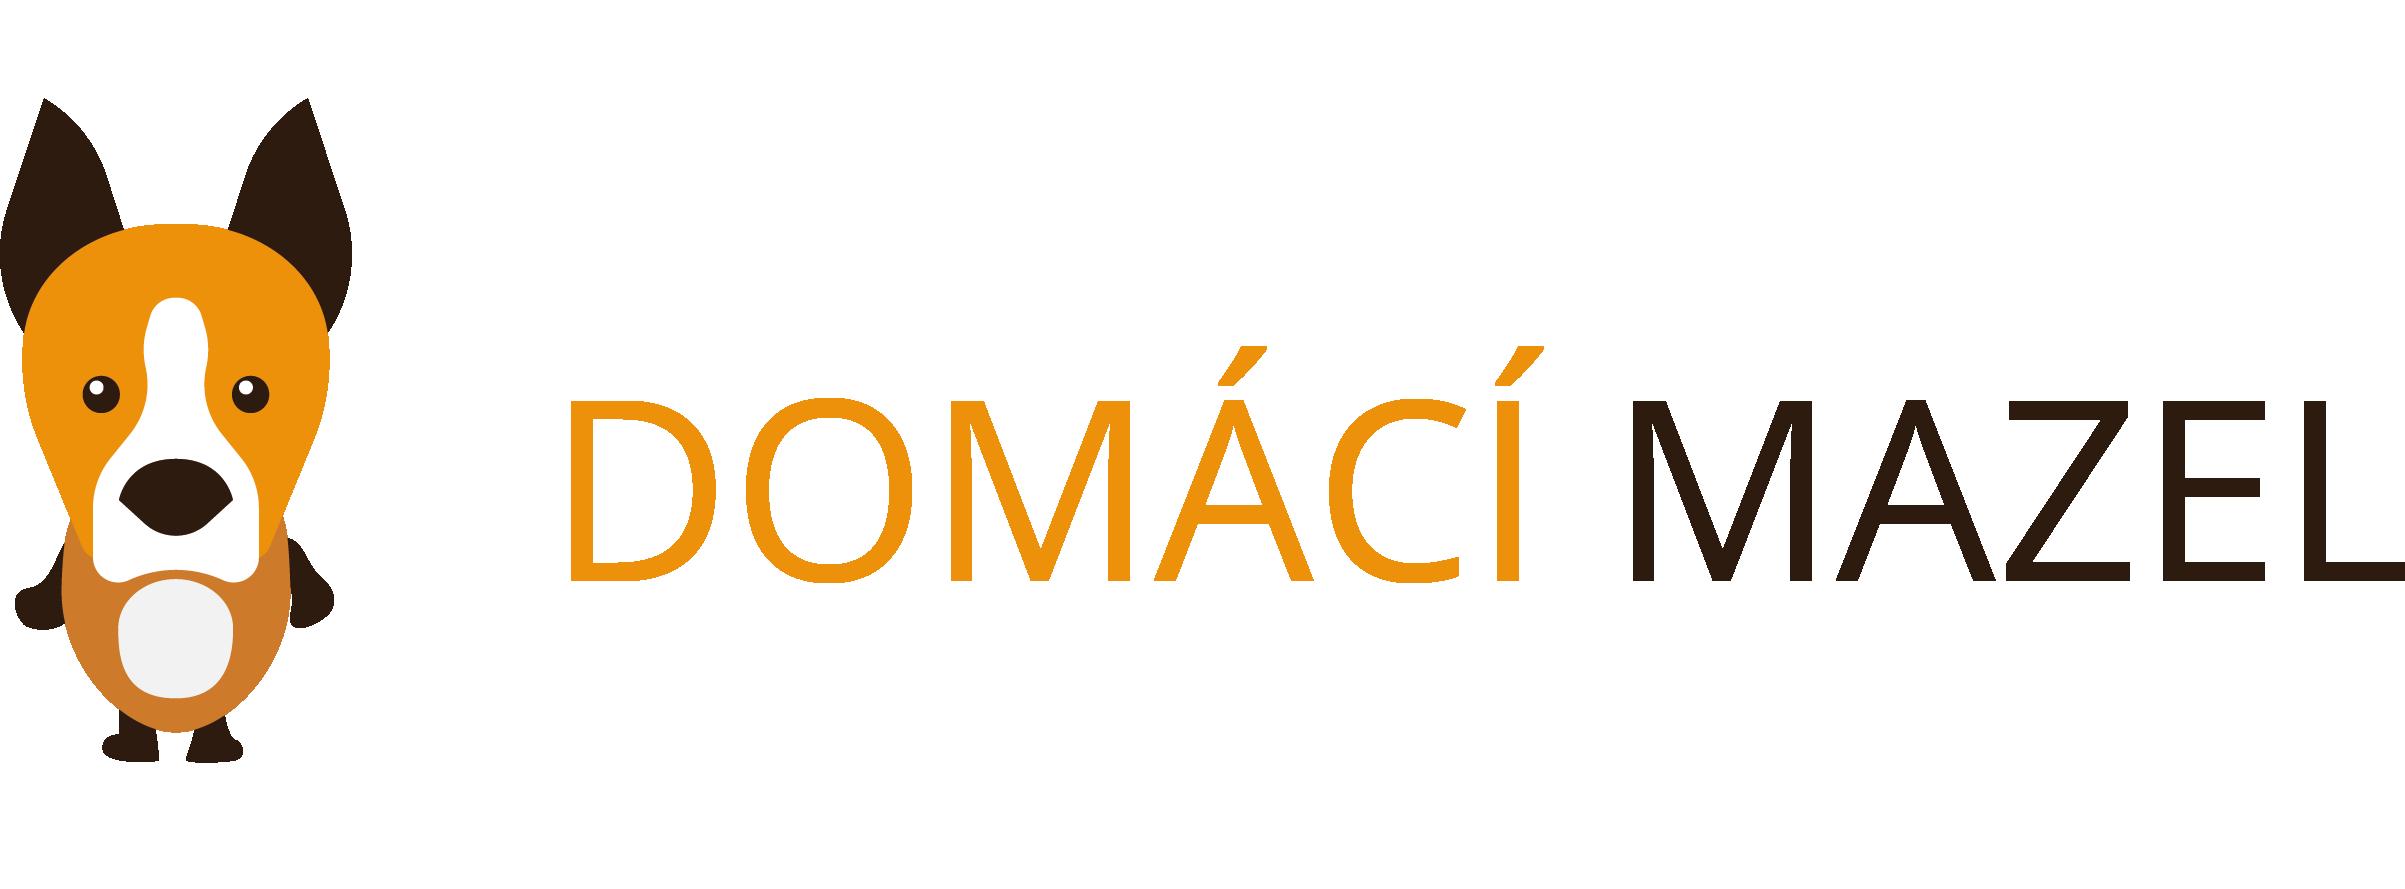 DomaciMazel.cz